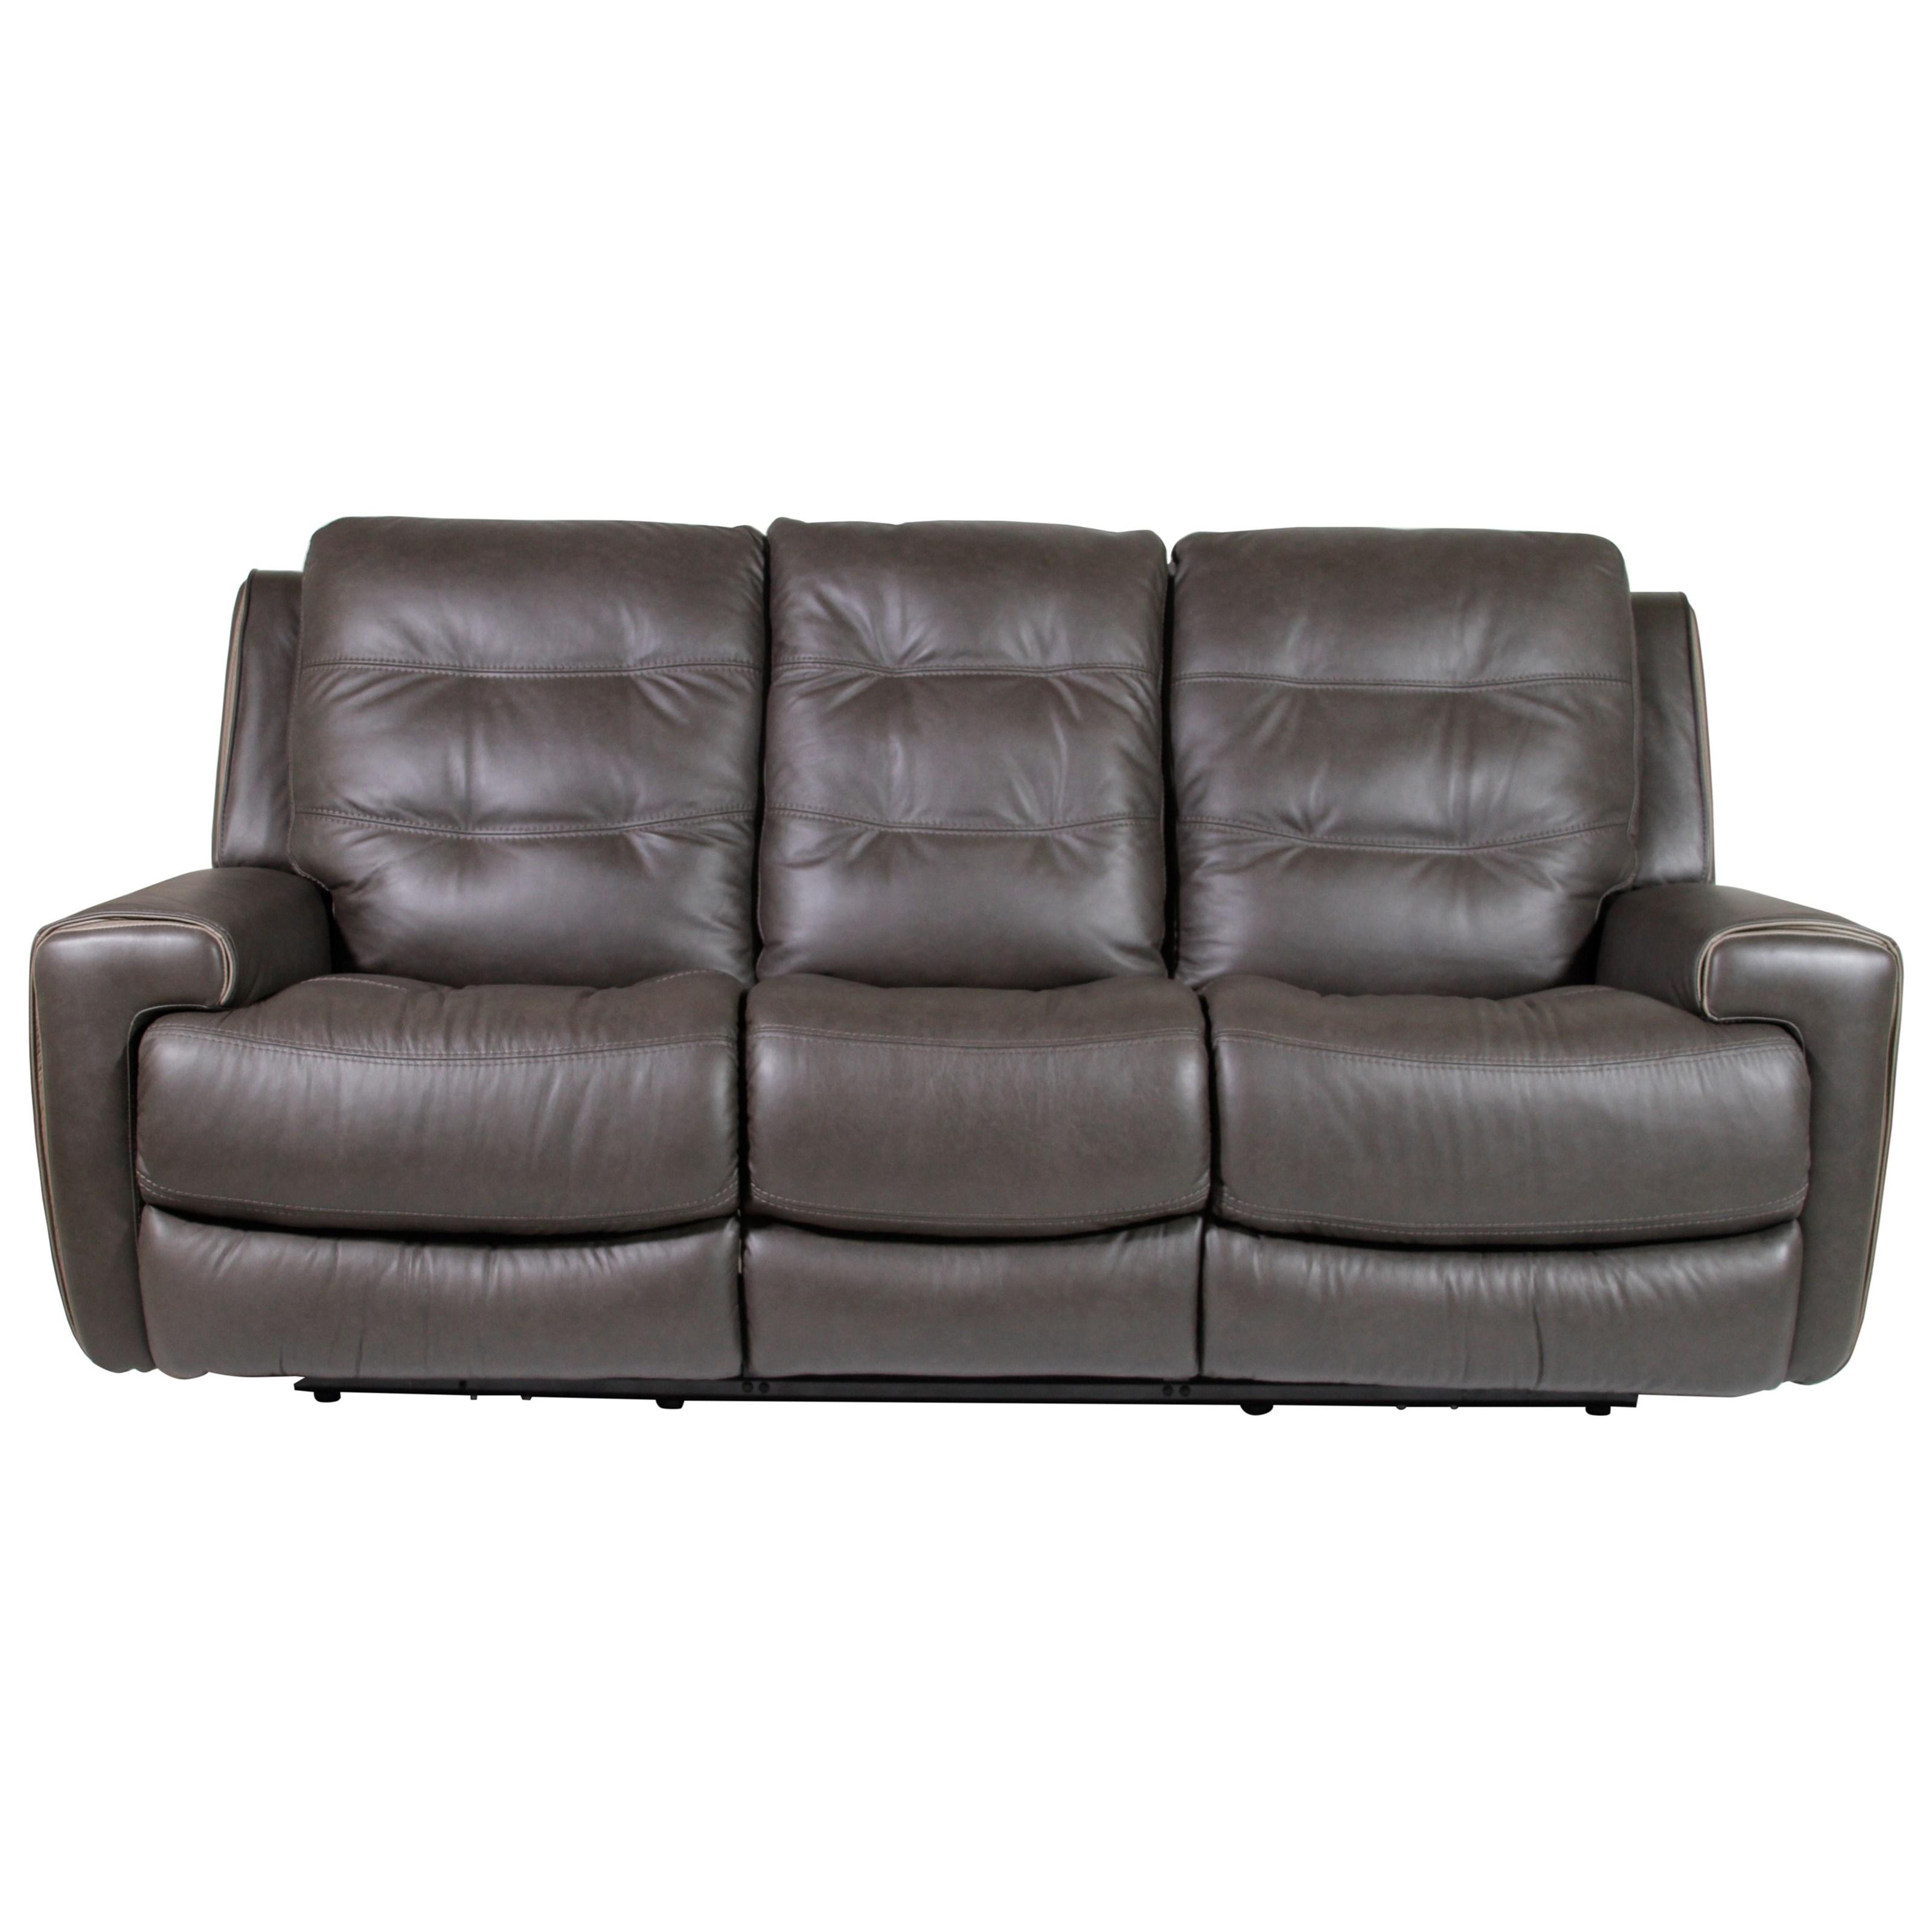 ... Flexsteel Wicklow Power Reclining Sofa. Shown in the 326-70 leather match  sc 1 st  HomeWorld Furniture & Flexsteel Wicklow Power Reclining Sofa - HomeWorld Furniture ... islam-shia.org